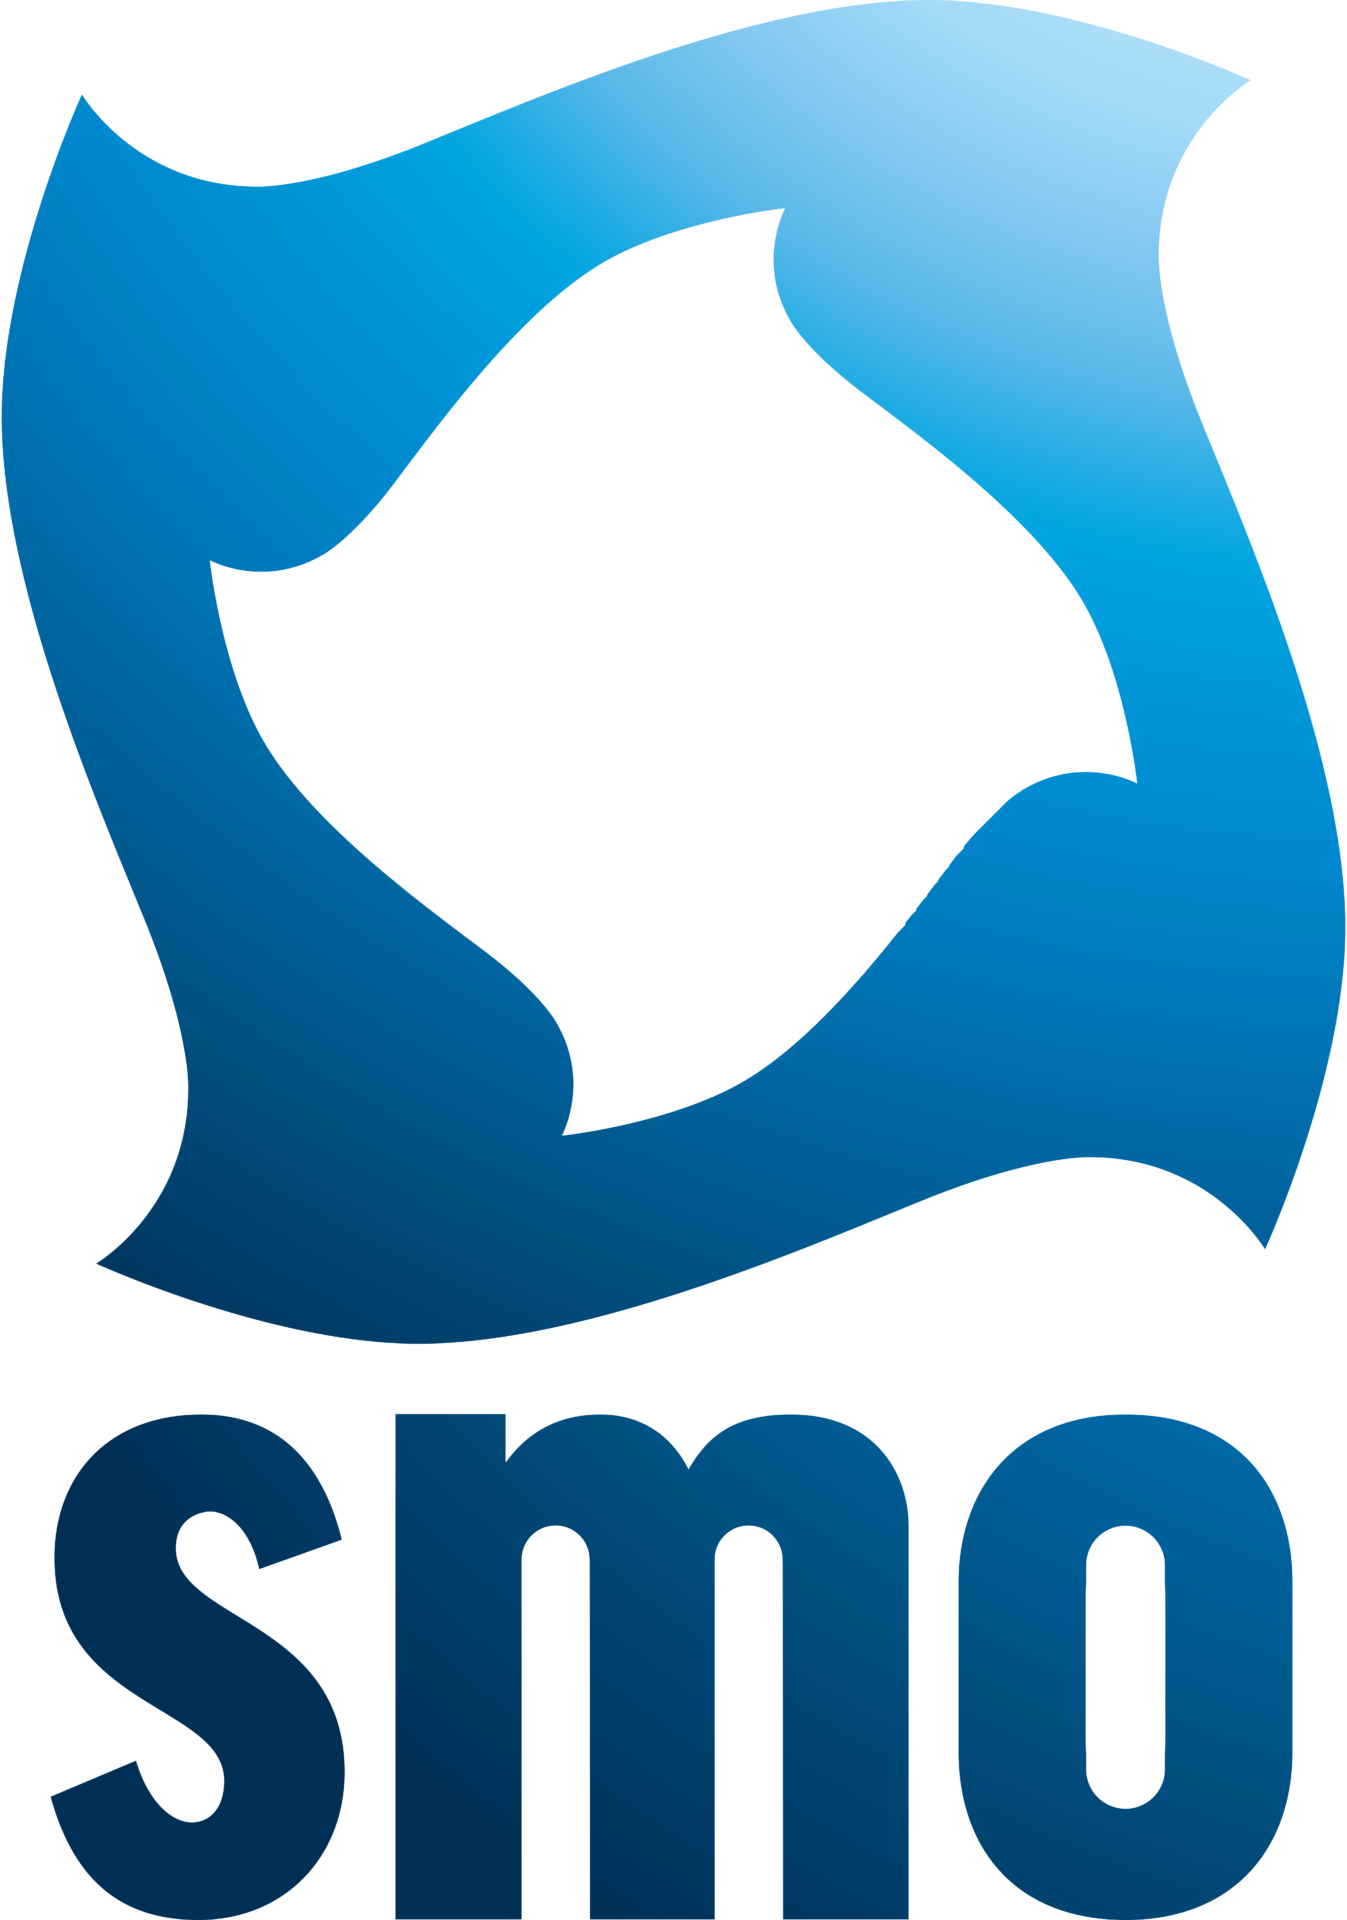 SMO-logo-png-9